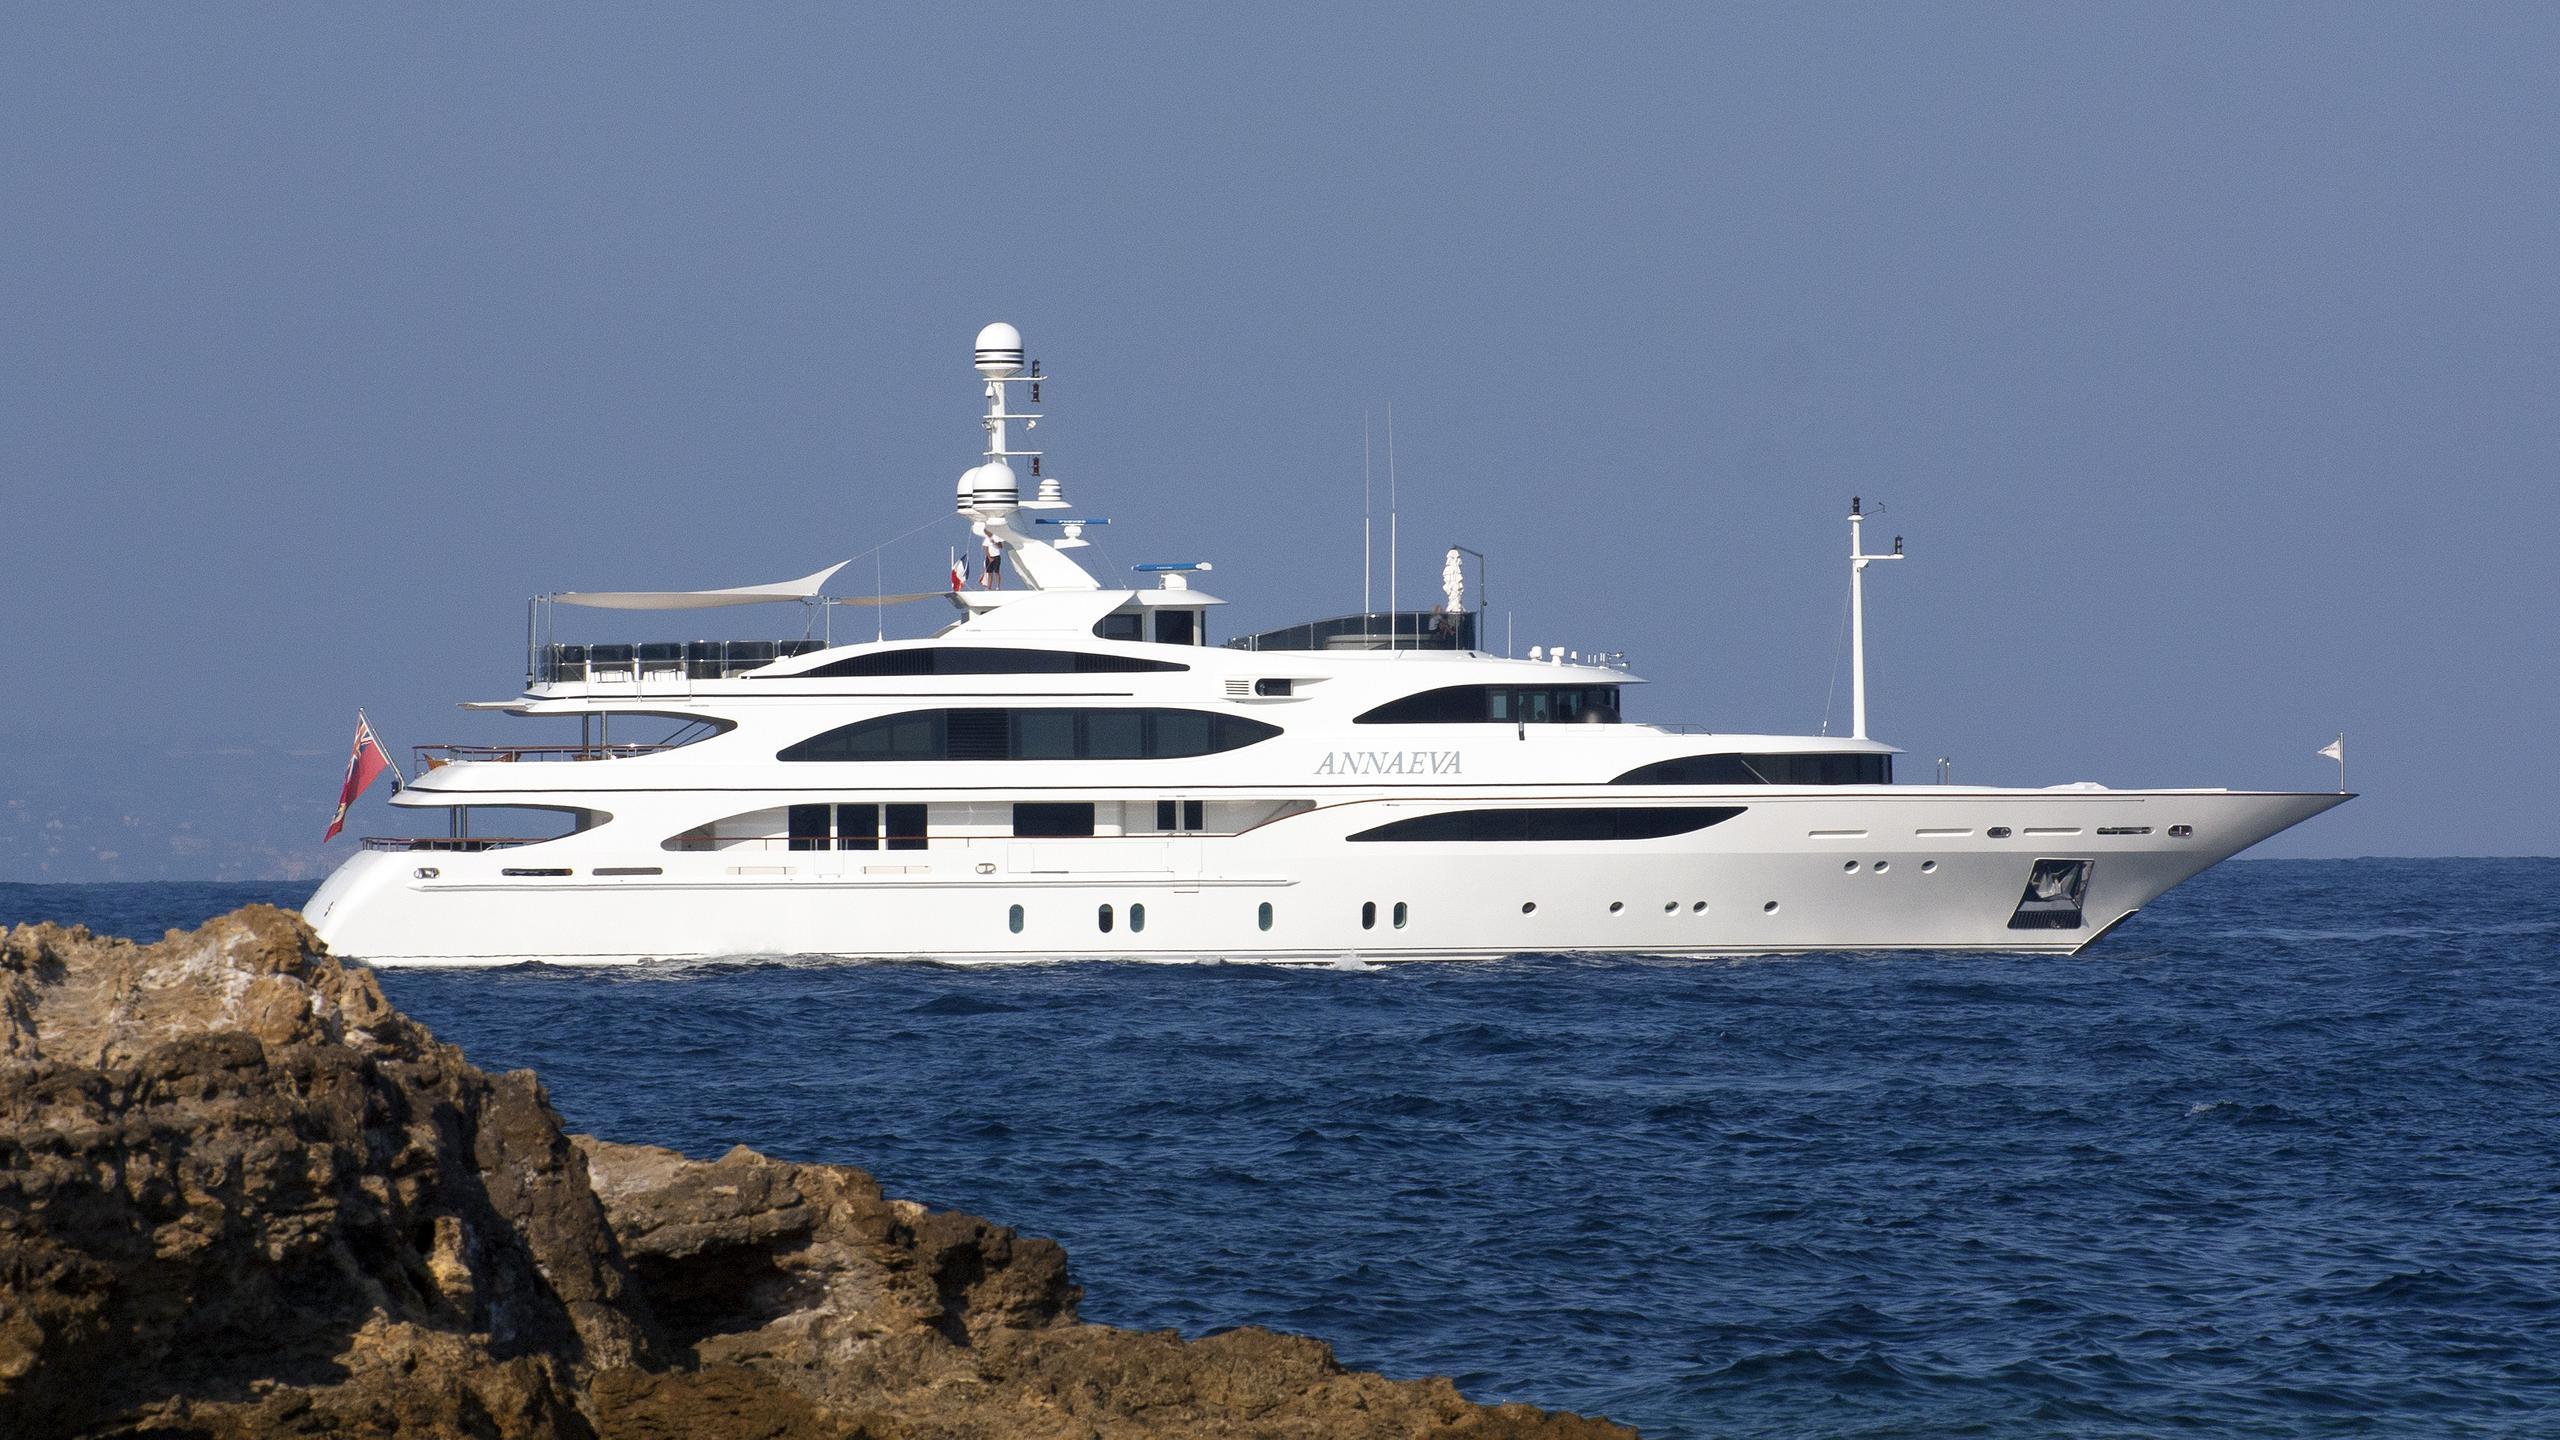 annaeva-motor-yacht-benetti-2007-56m-profile